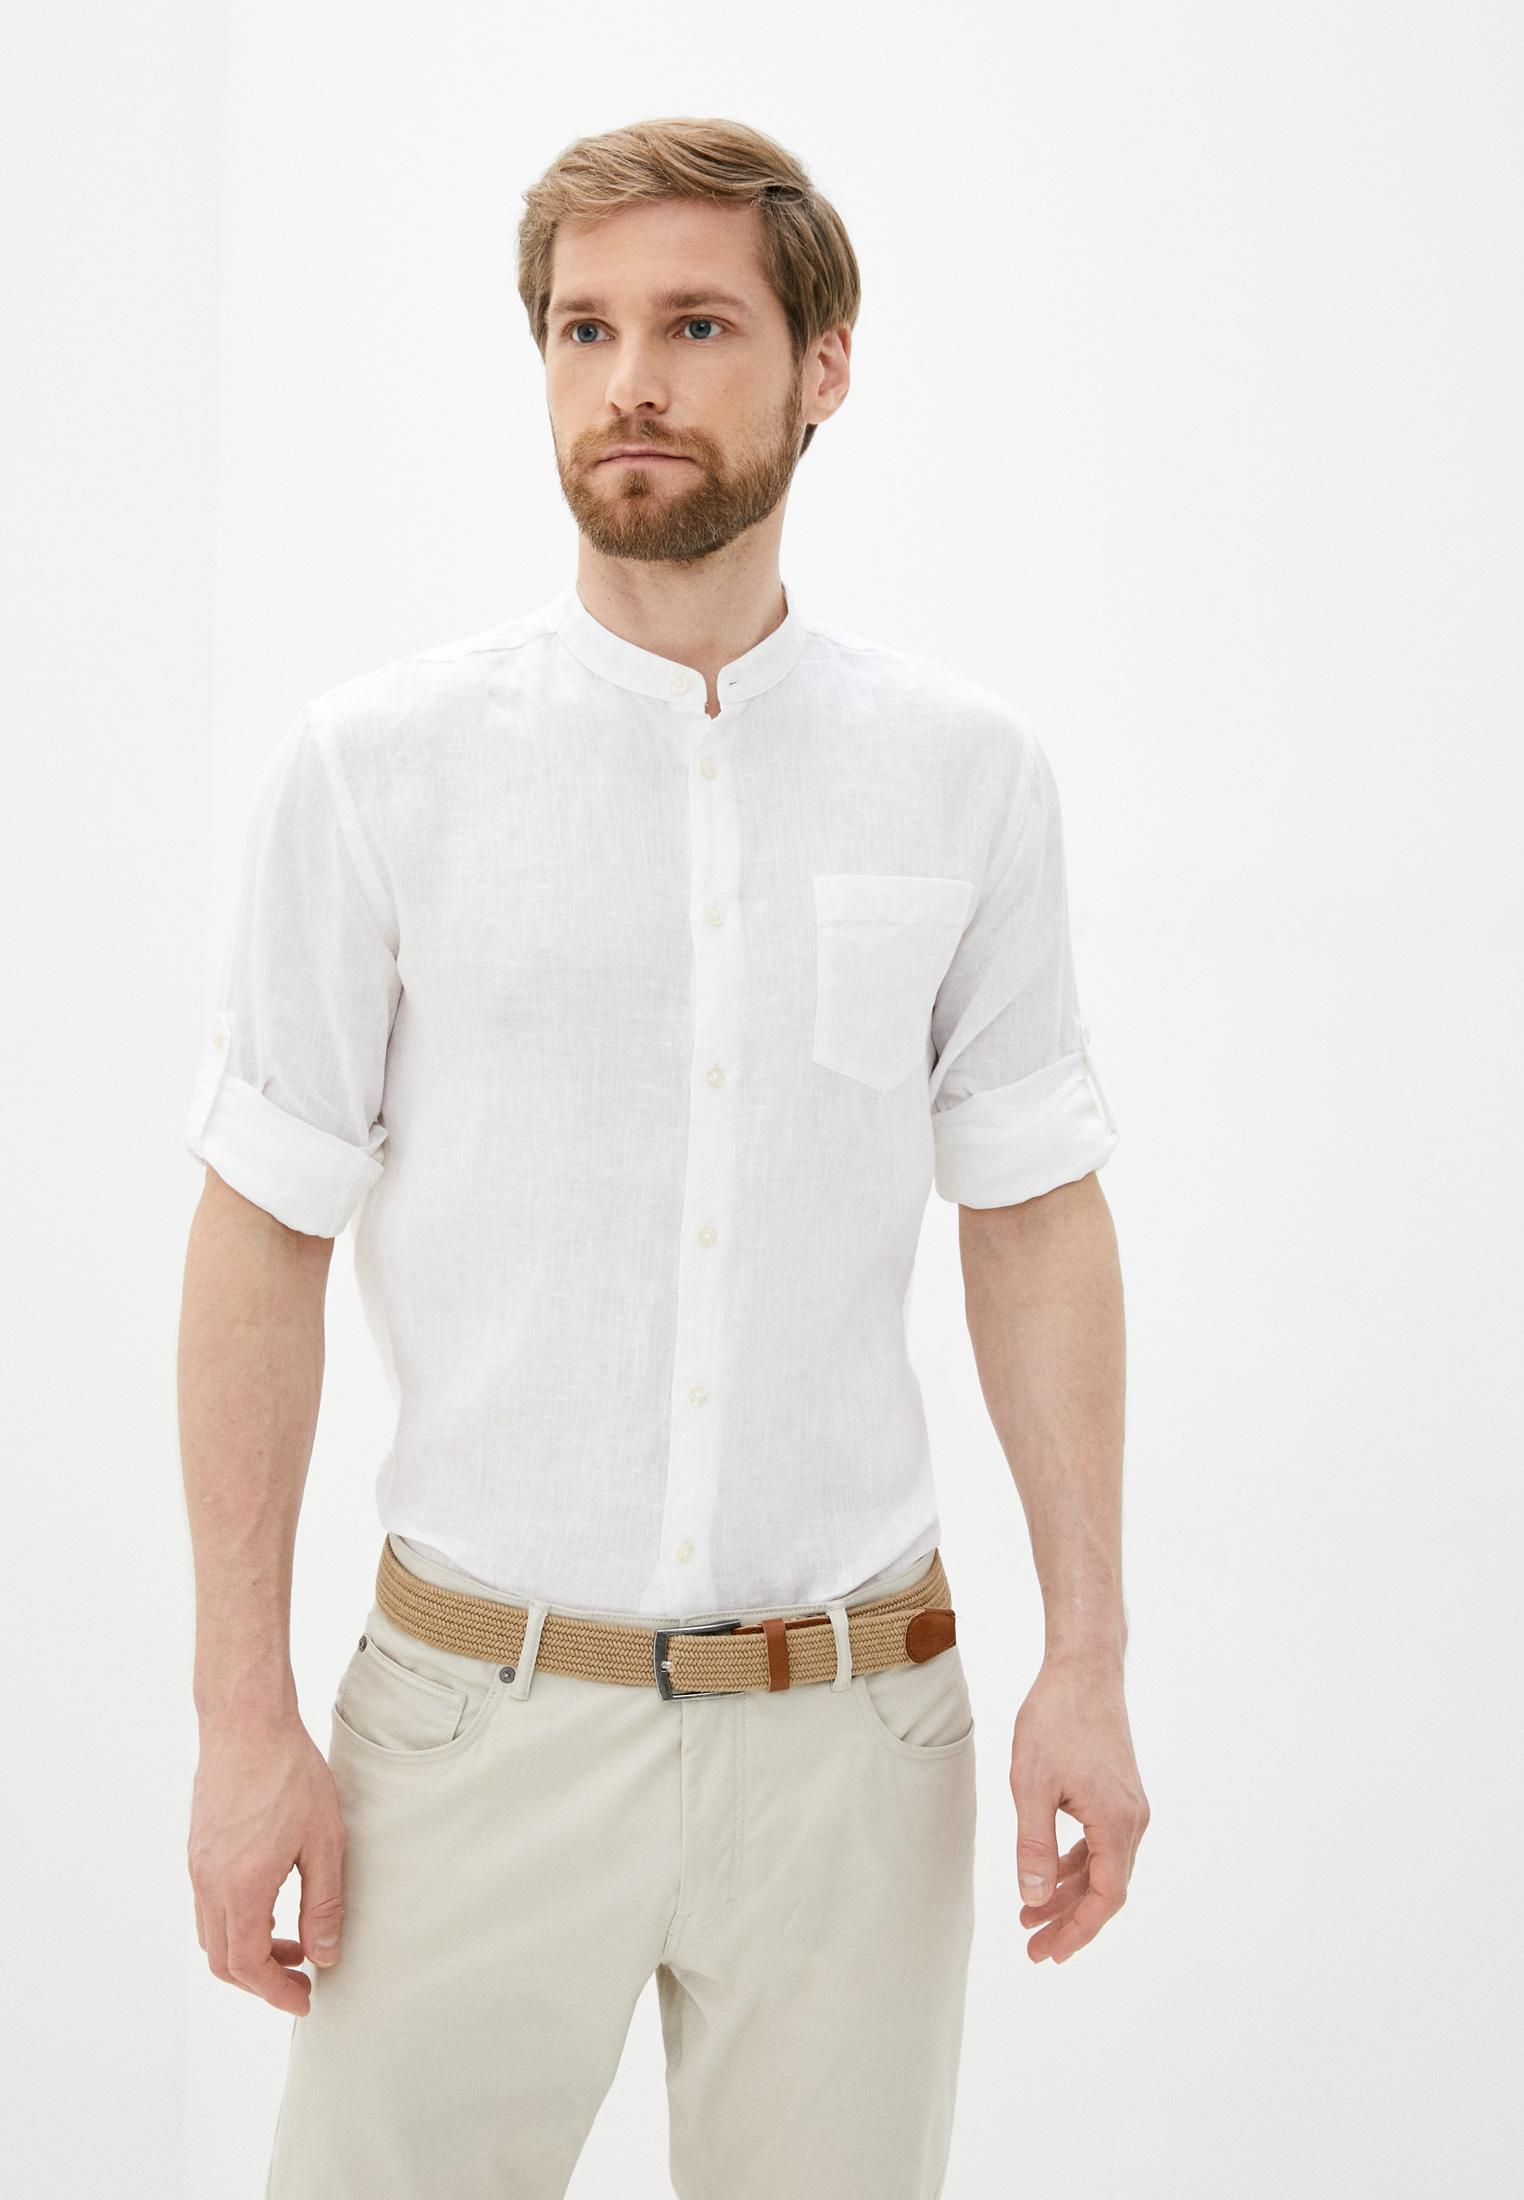 Рубашка с длинным рукавом United Colors of Benetton (Юнайтед Колорс оф Бенеттон) Рубашка United Colors of Benetton